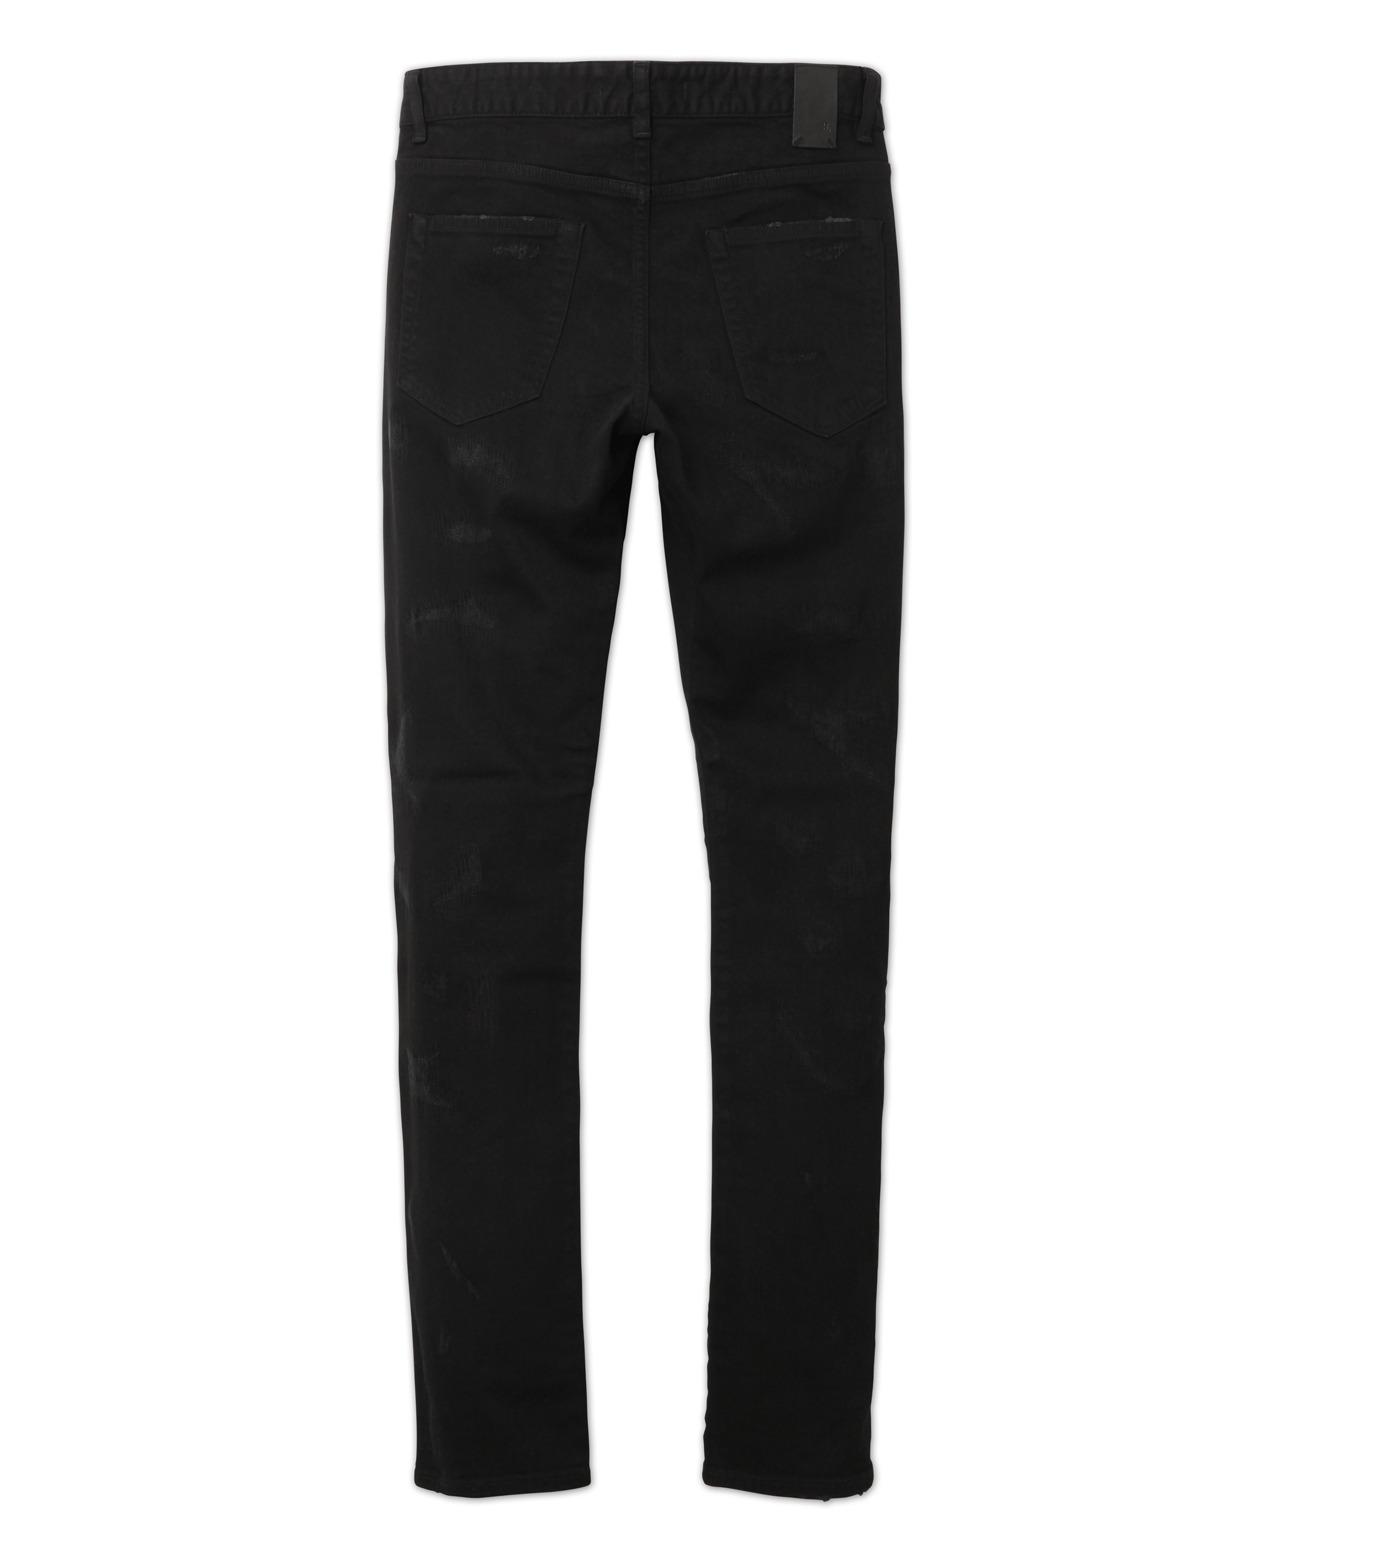 HL HEDDIE LOVU(エイチエル・エディールーヴ)のBlack Damege HL-BLACK(パンツ/pants)-17A98002-13 拡大詳細画像7